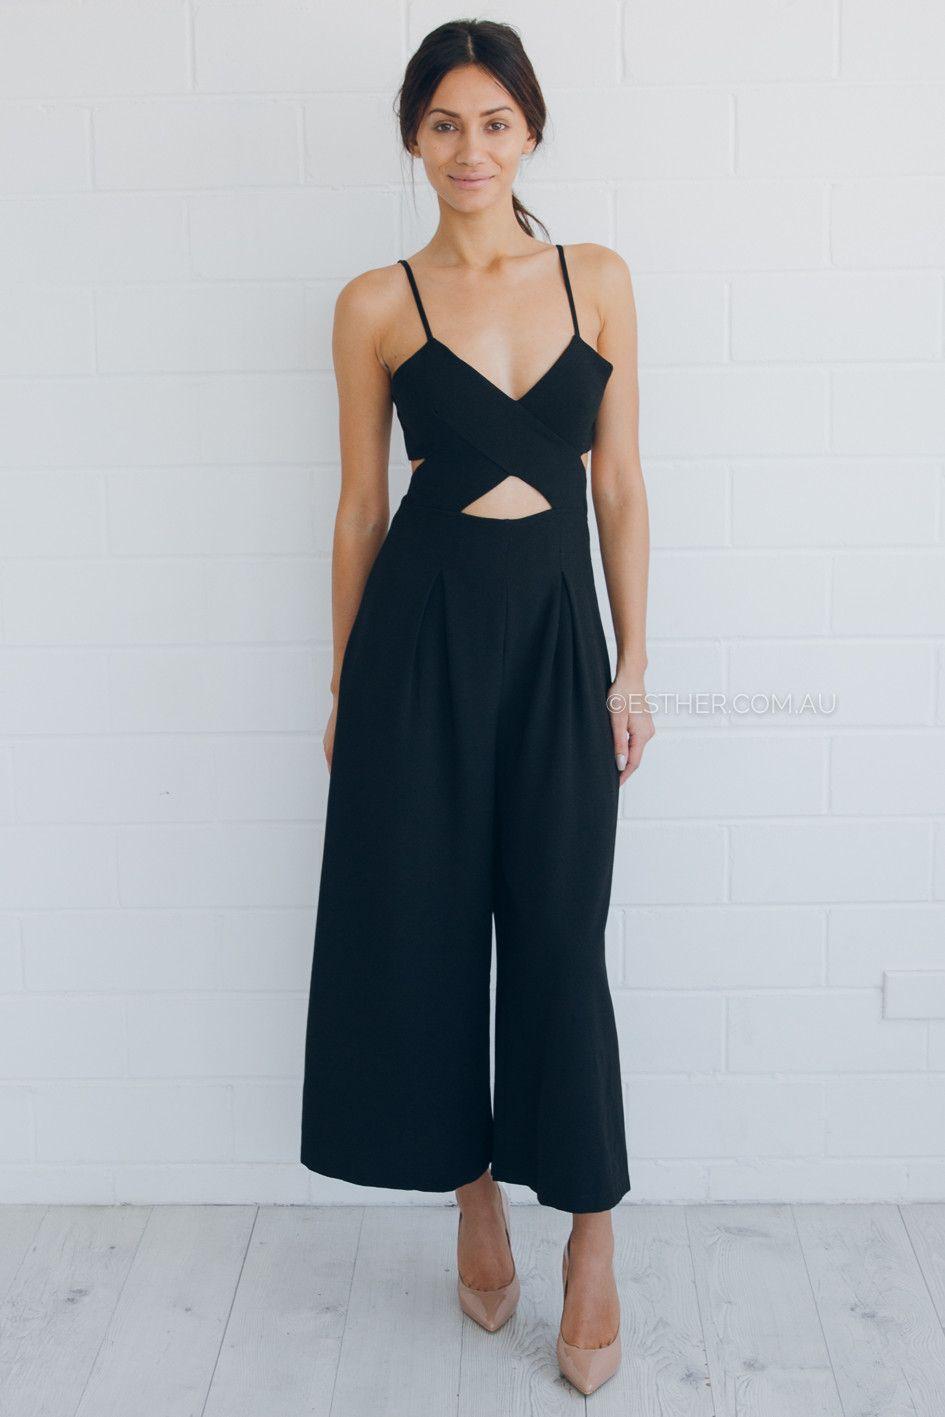 zara jumpsuit - black | Women's fashion | Pinterest | Zara ...